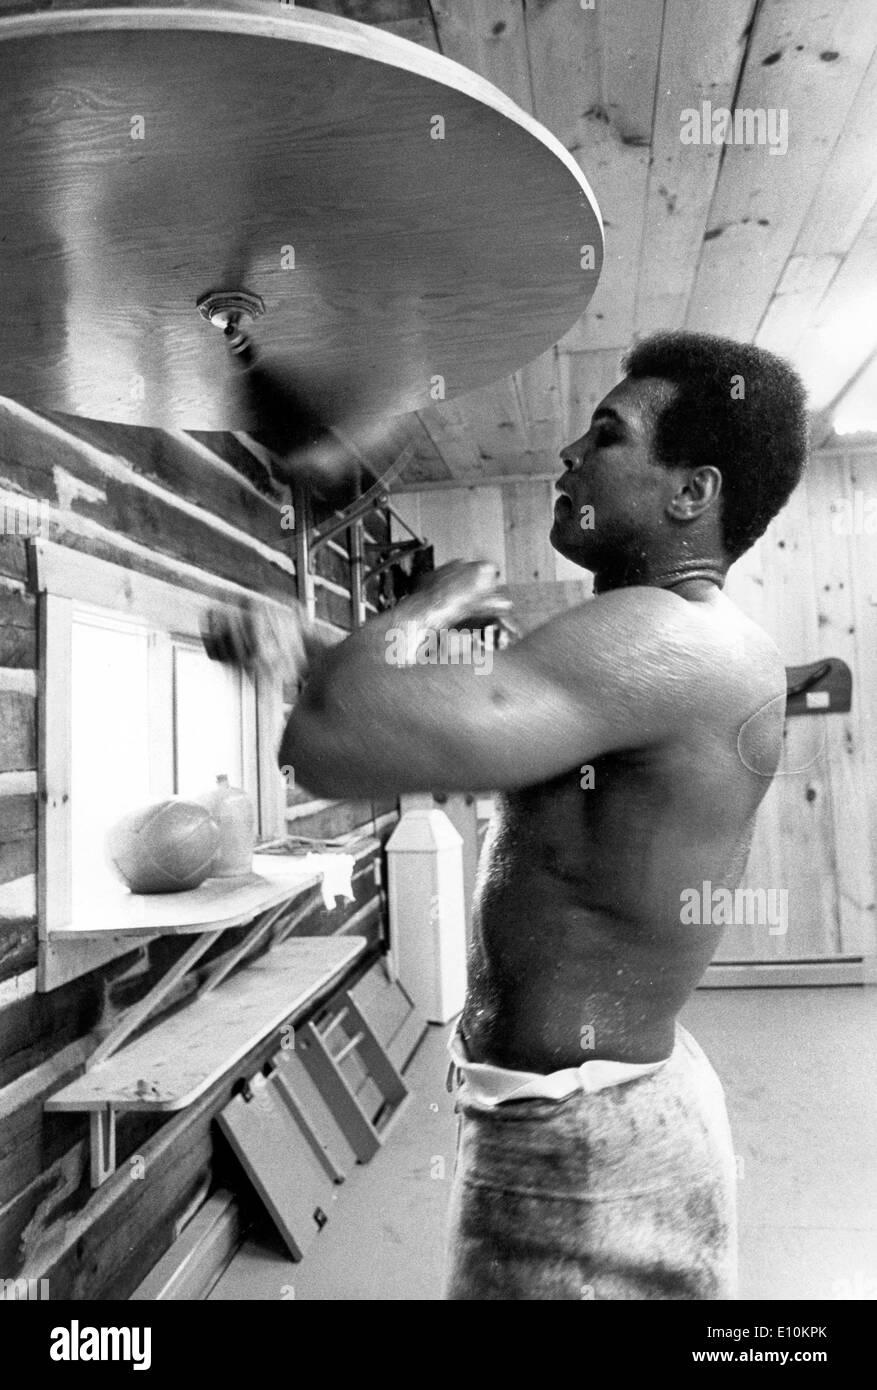 Boxer Muhammad Ali in training - Stock Image